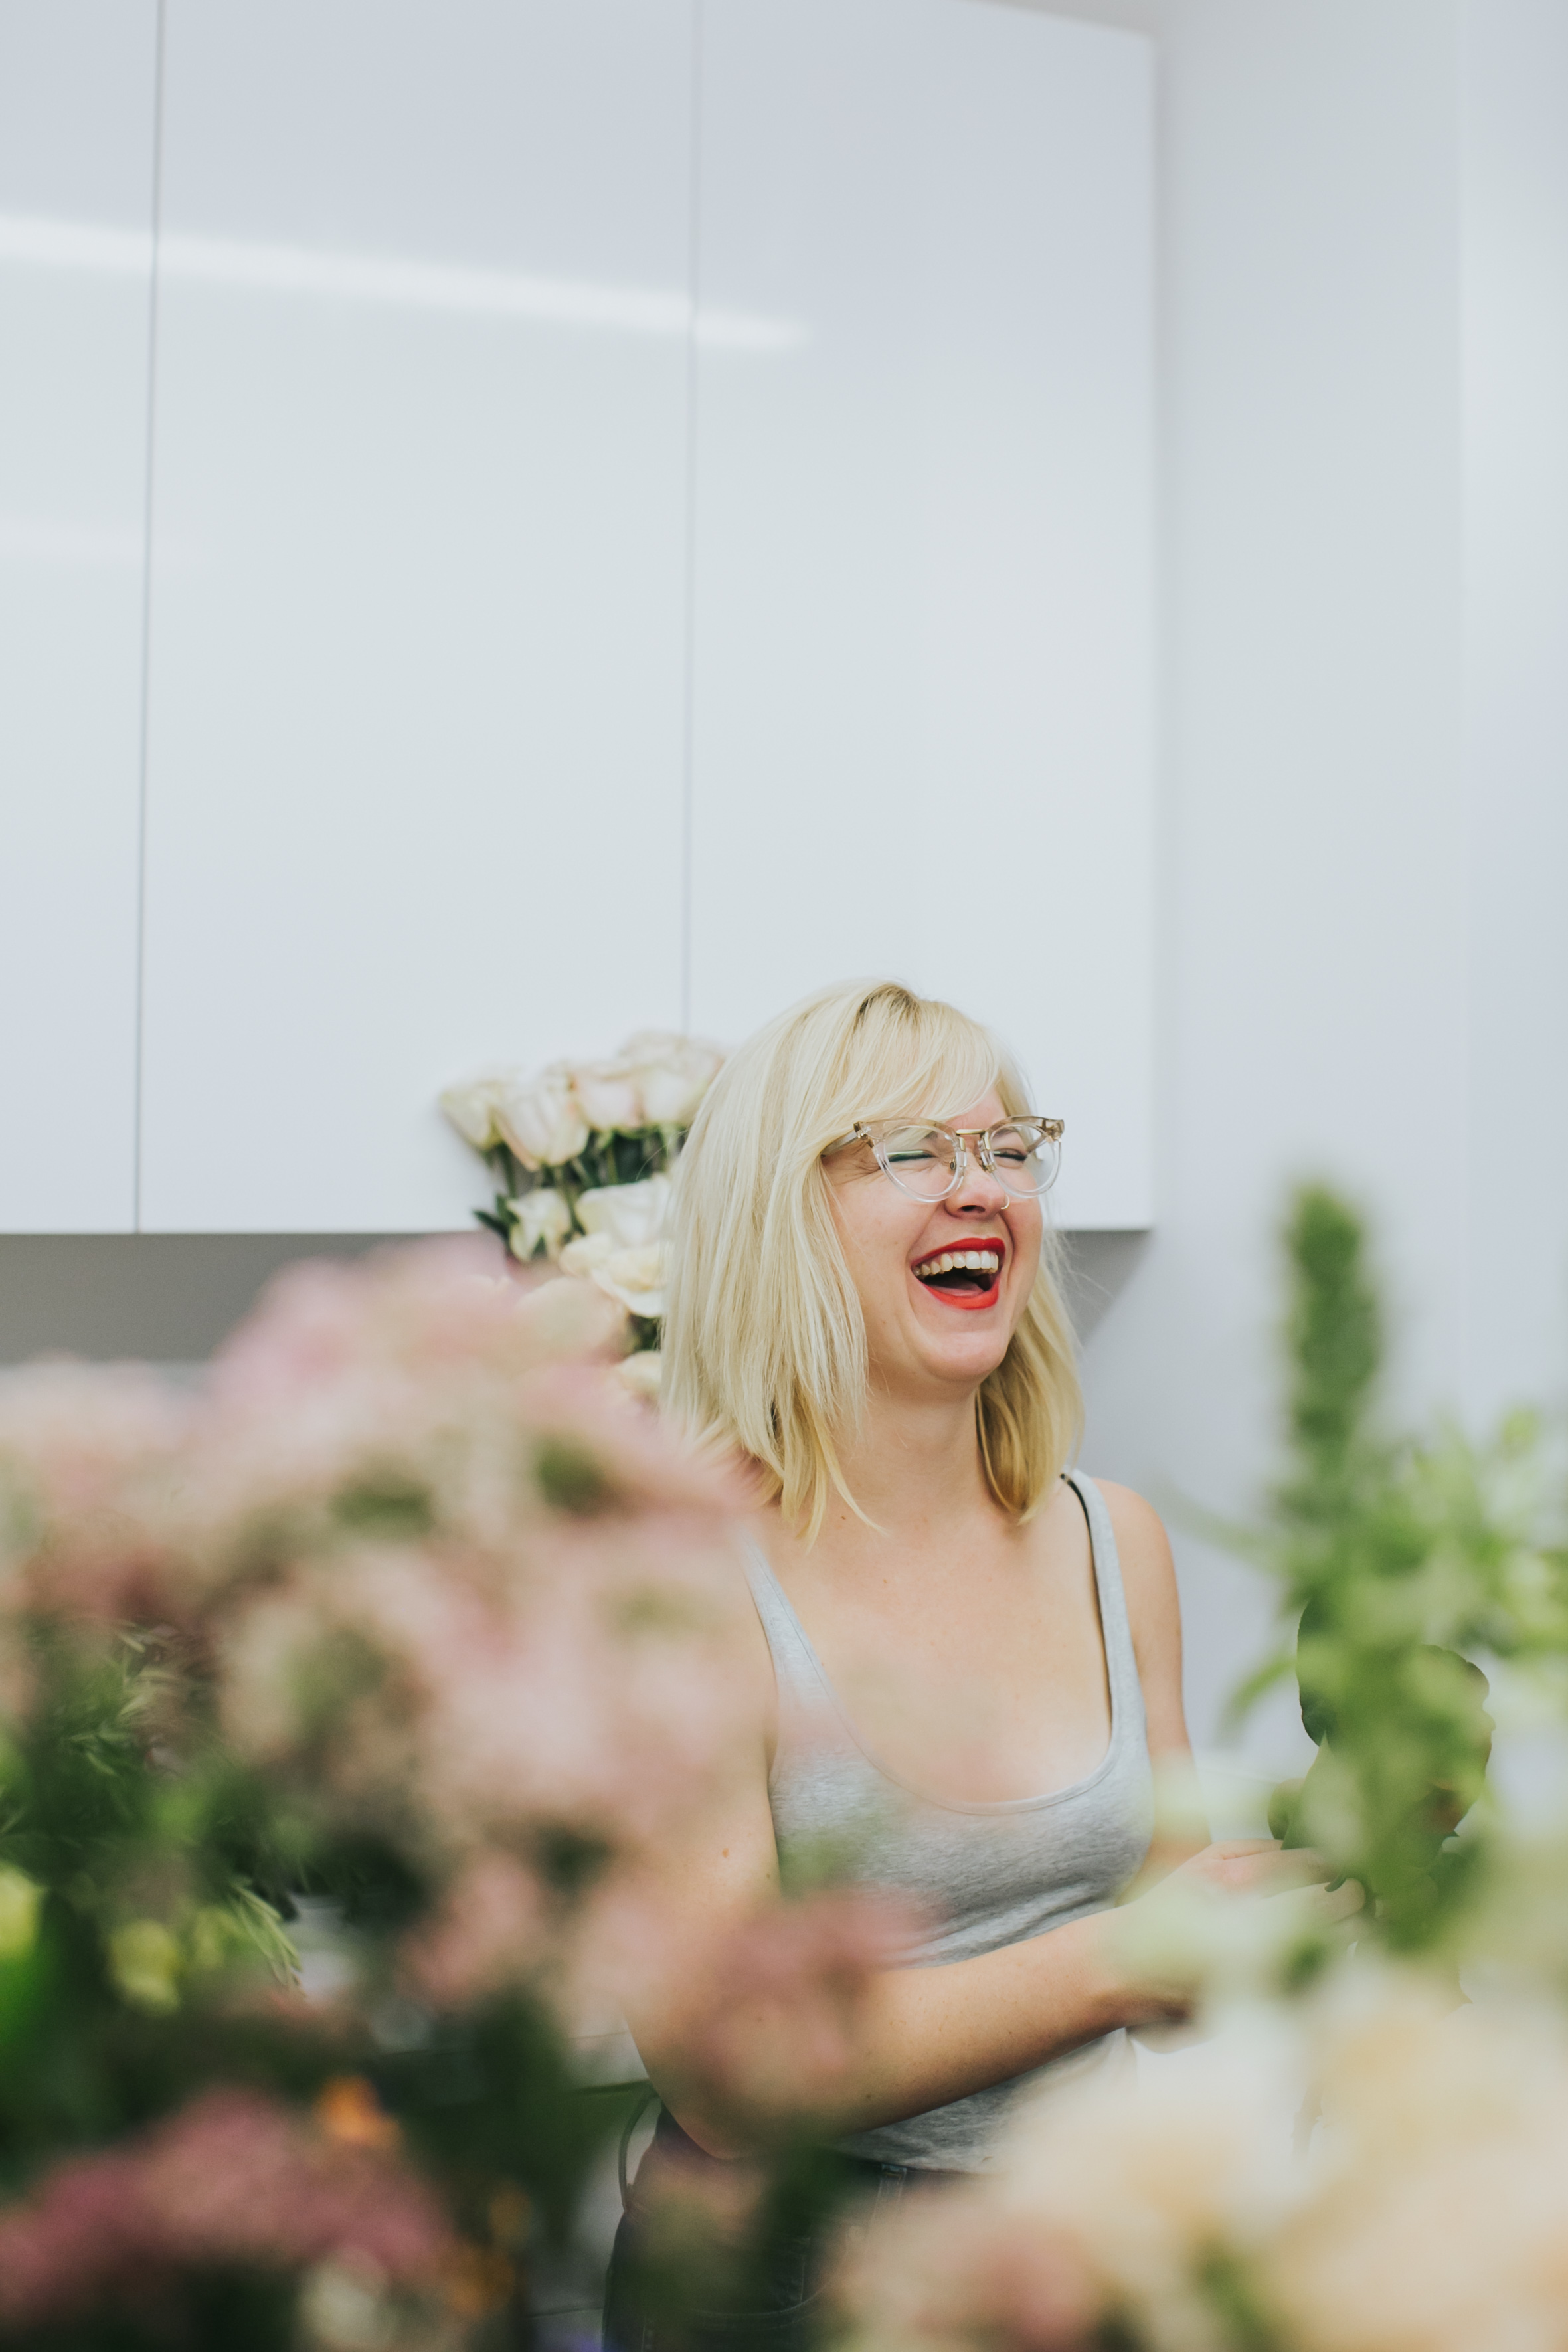 Malori Maeva - Owner at Form Floral